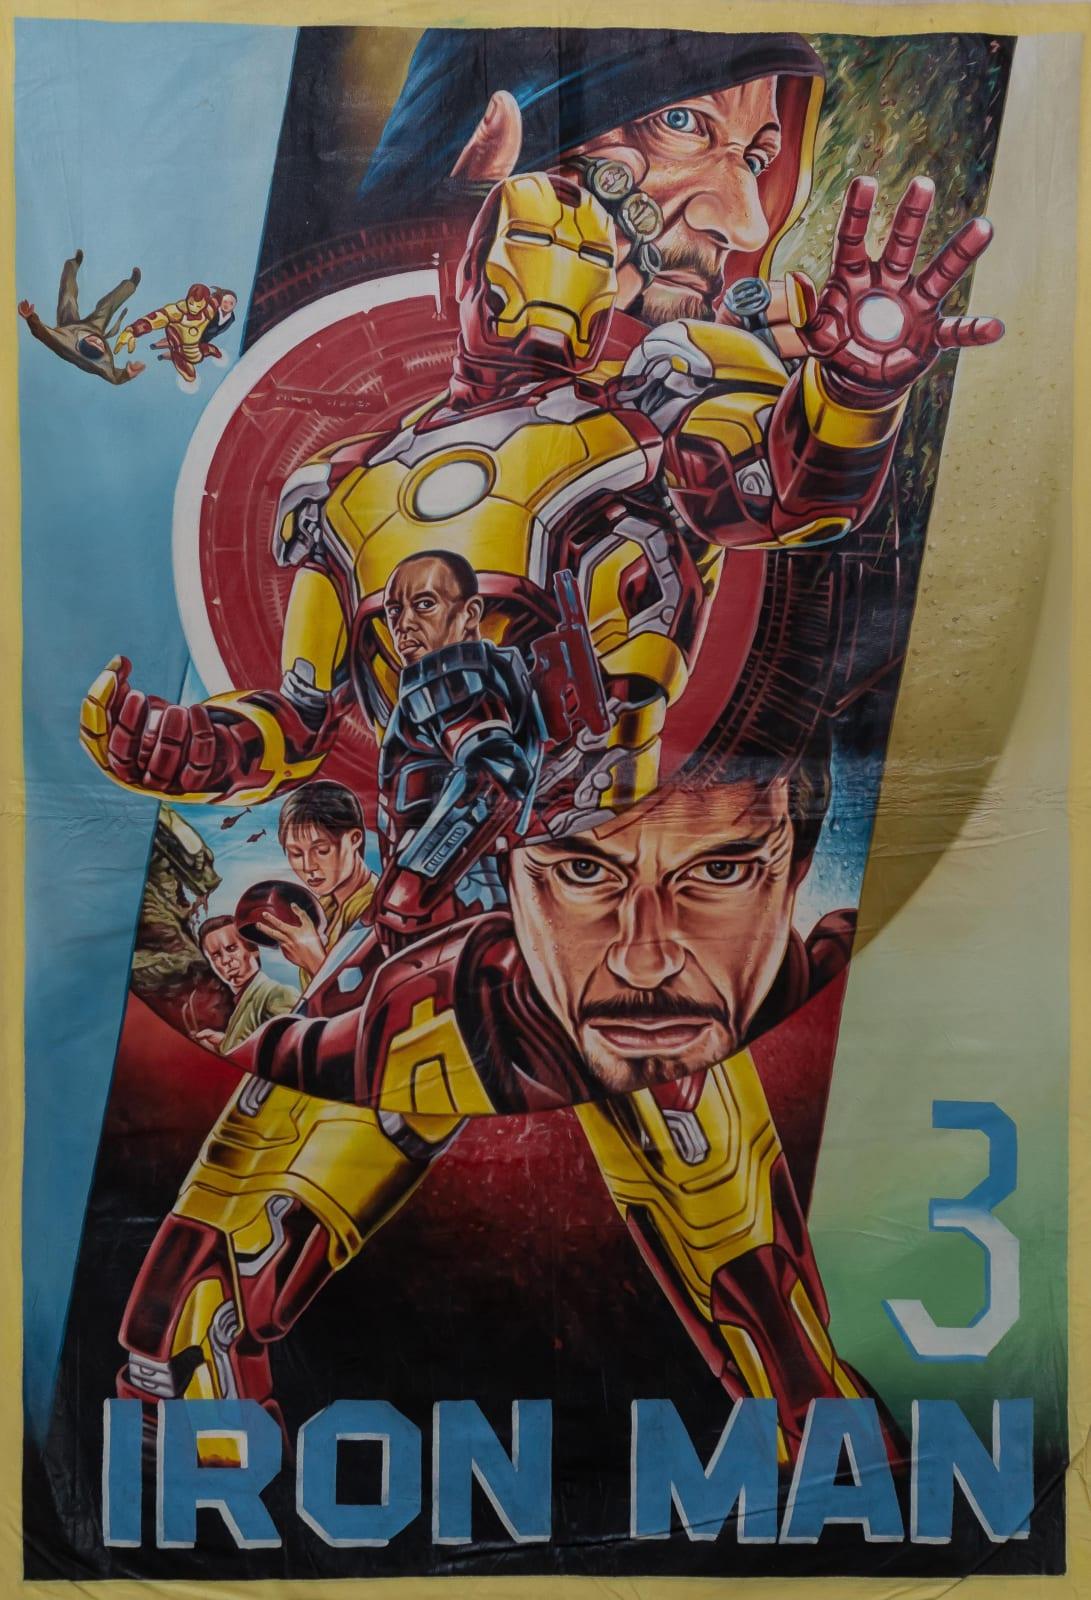 Iron Man 3 150 x 104 cm